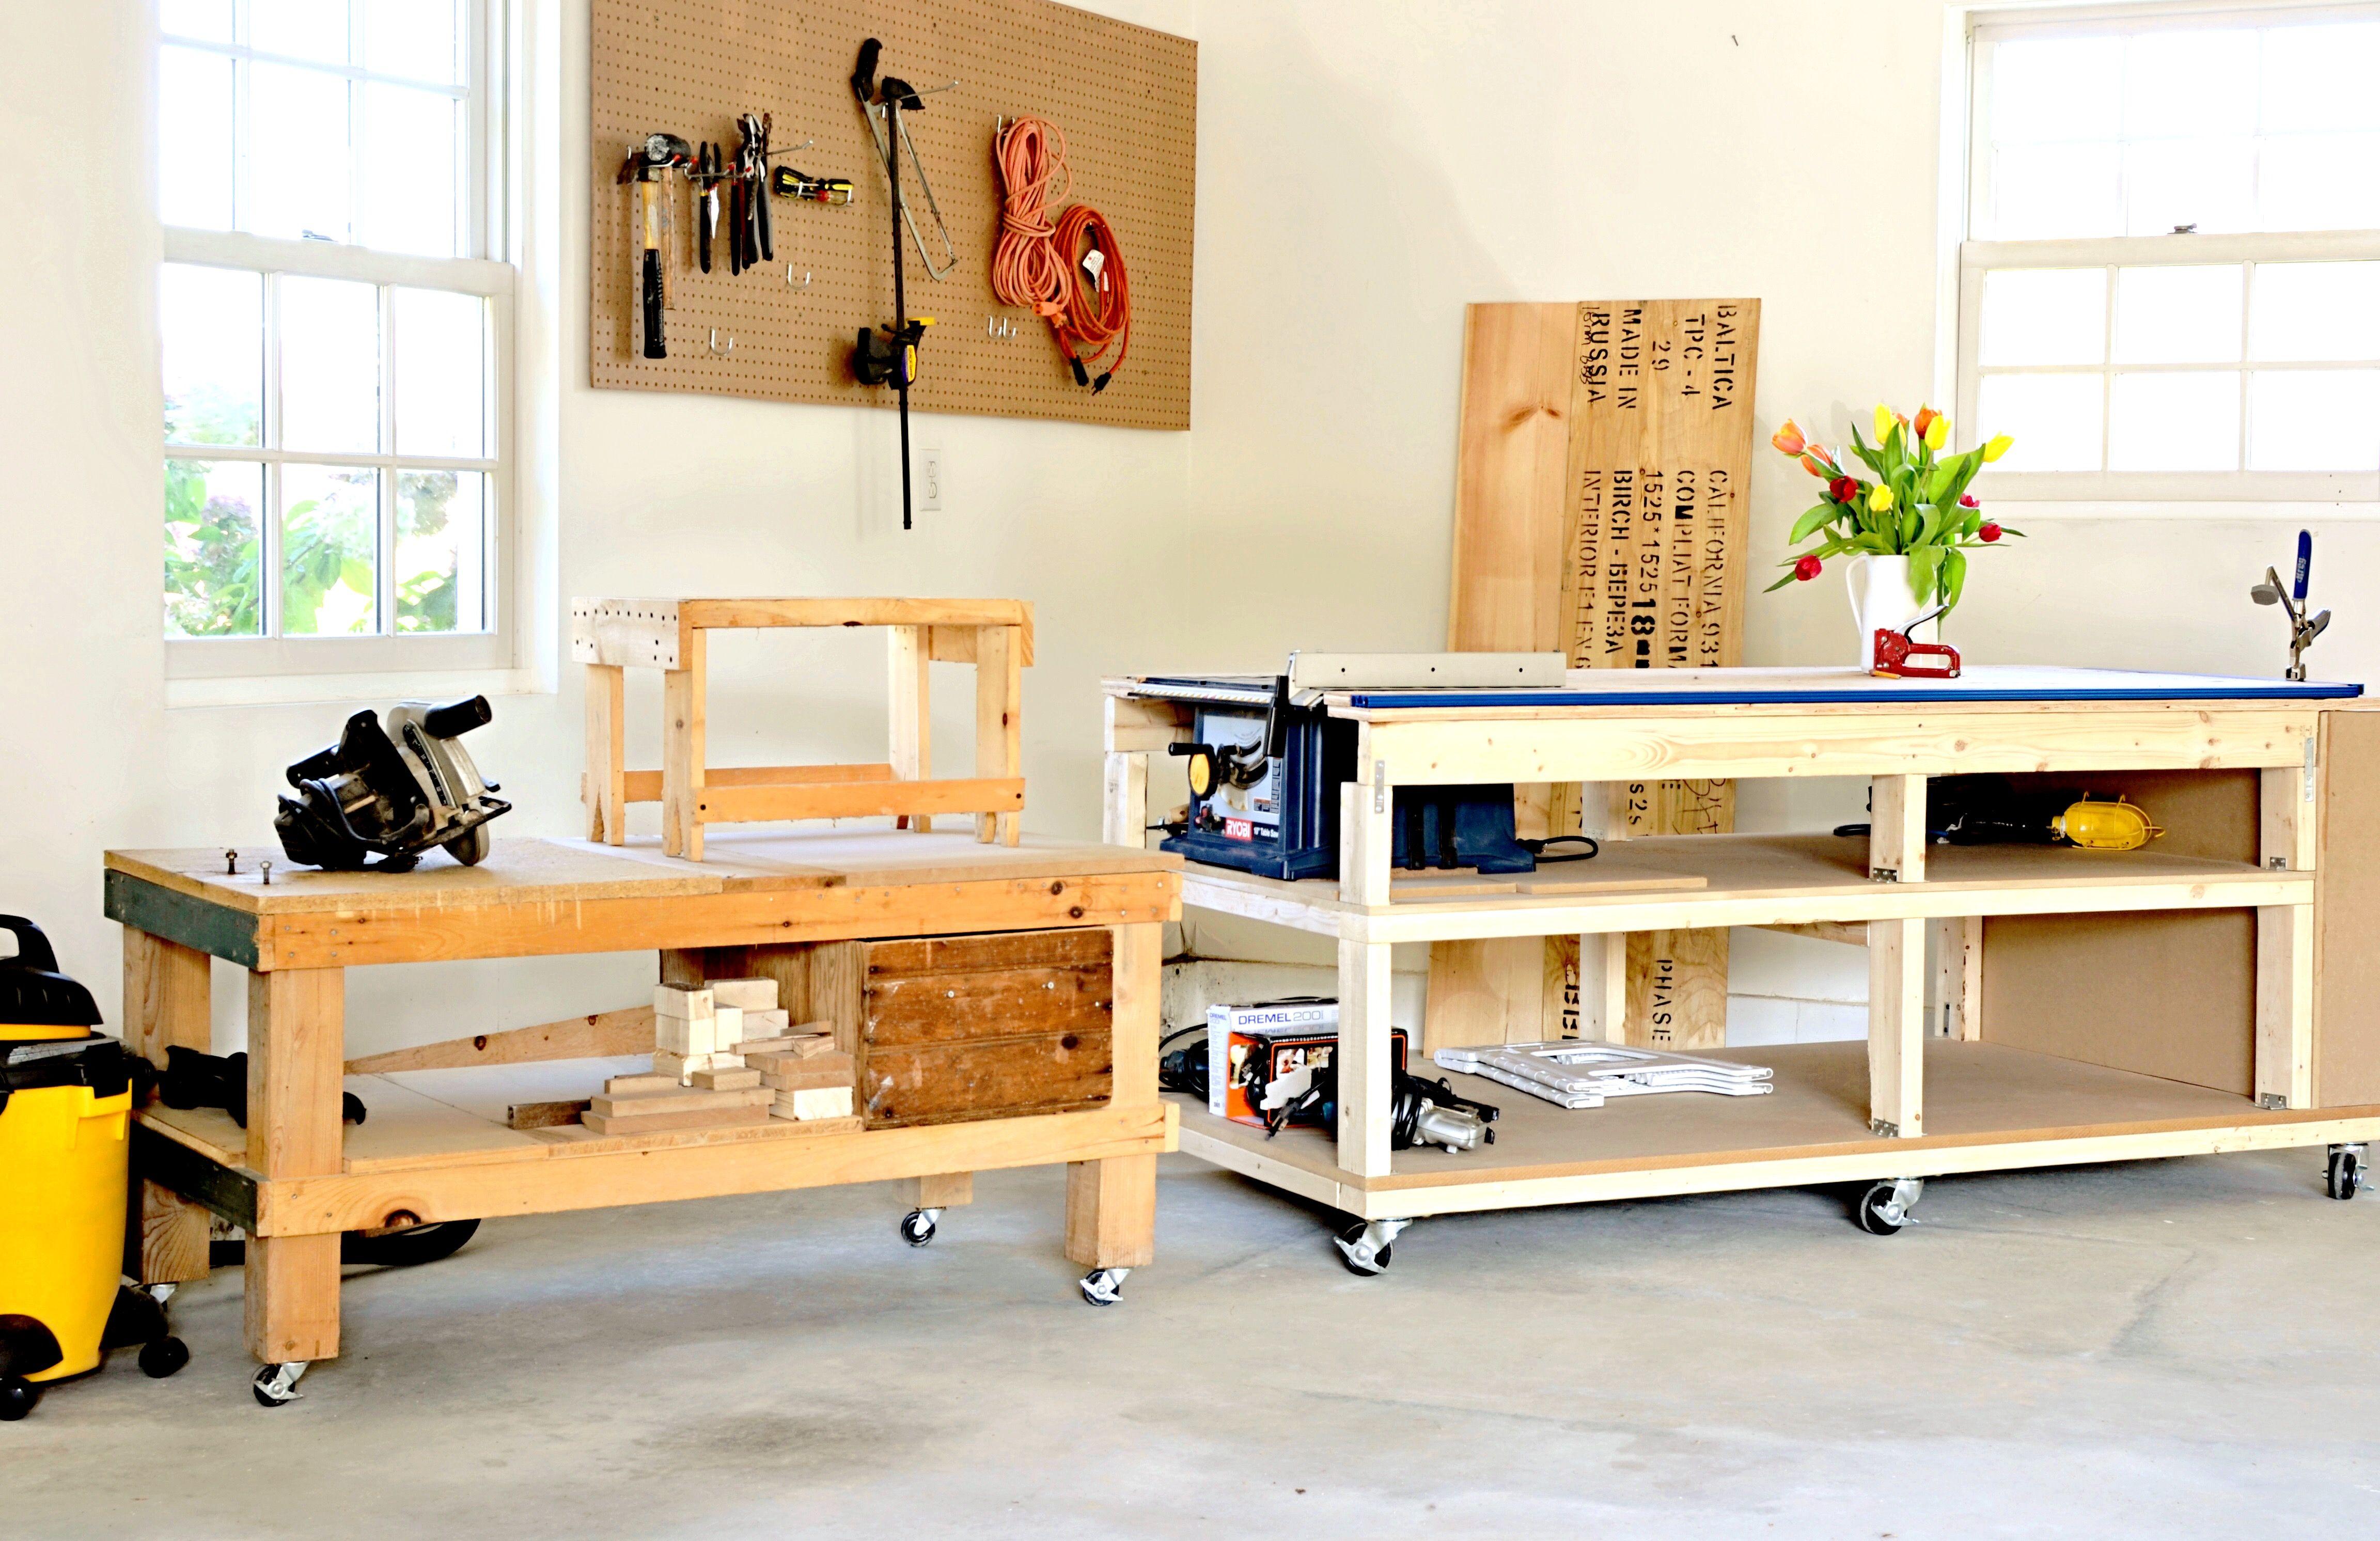 Single Post  Refinishing furniture diy, Home diy, Home workshop